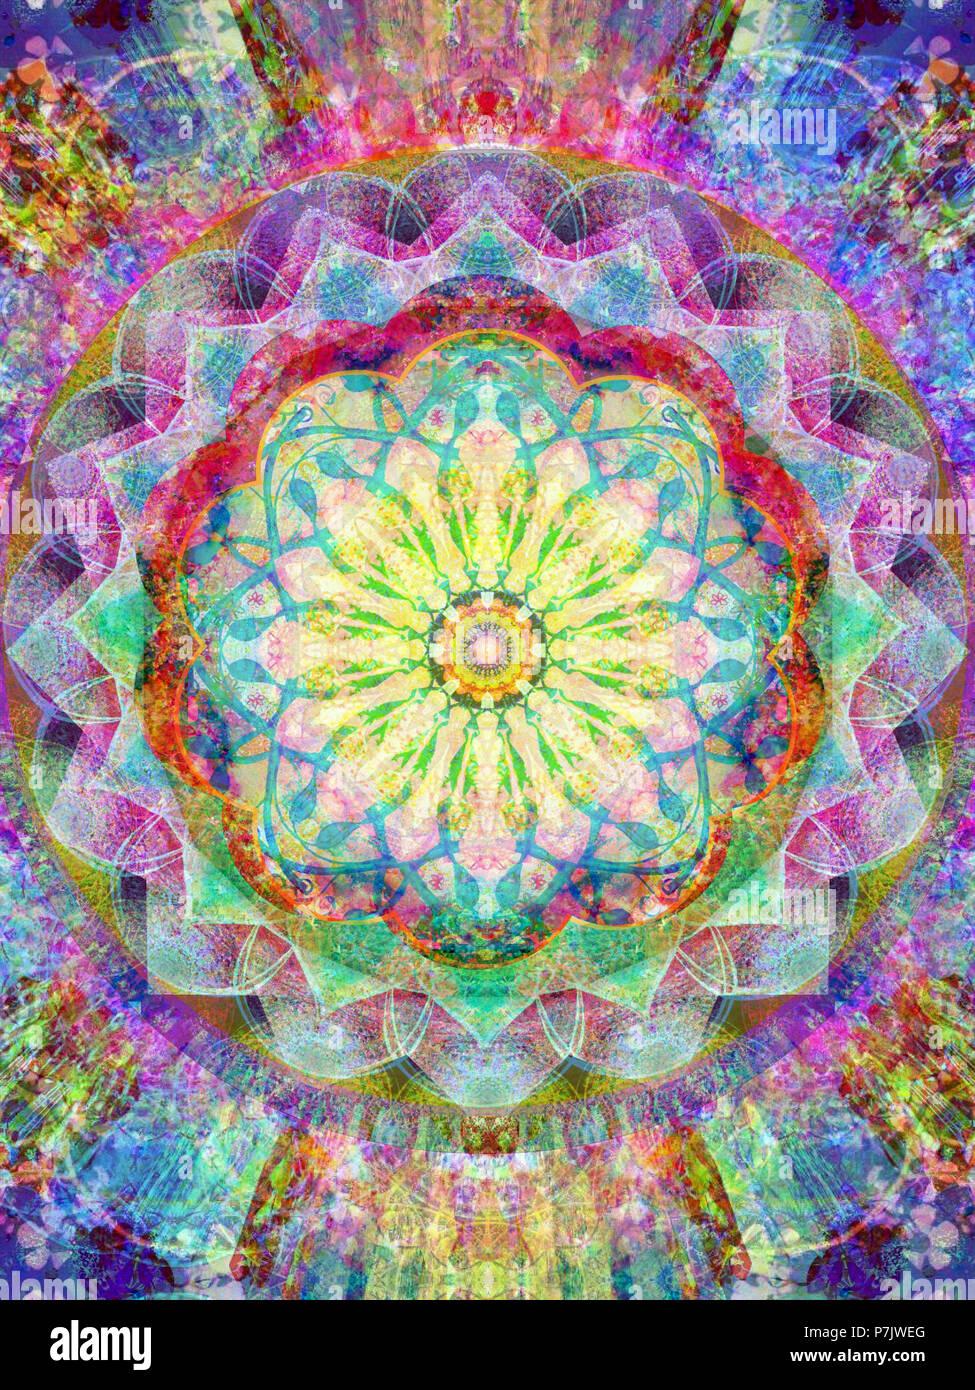 Photographic flower mandala, rainbow colors, - Stock Image